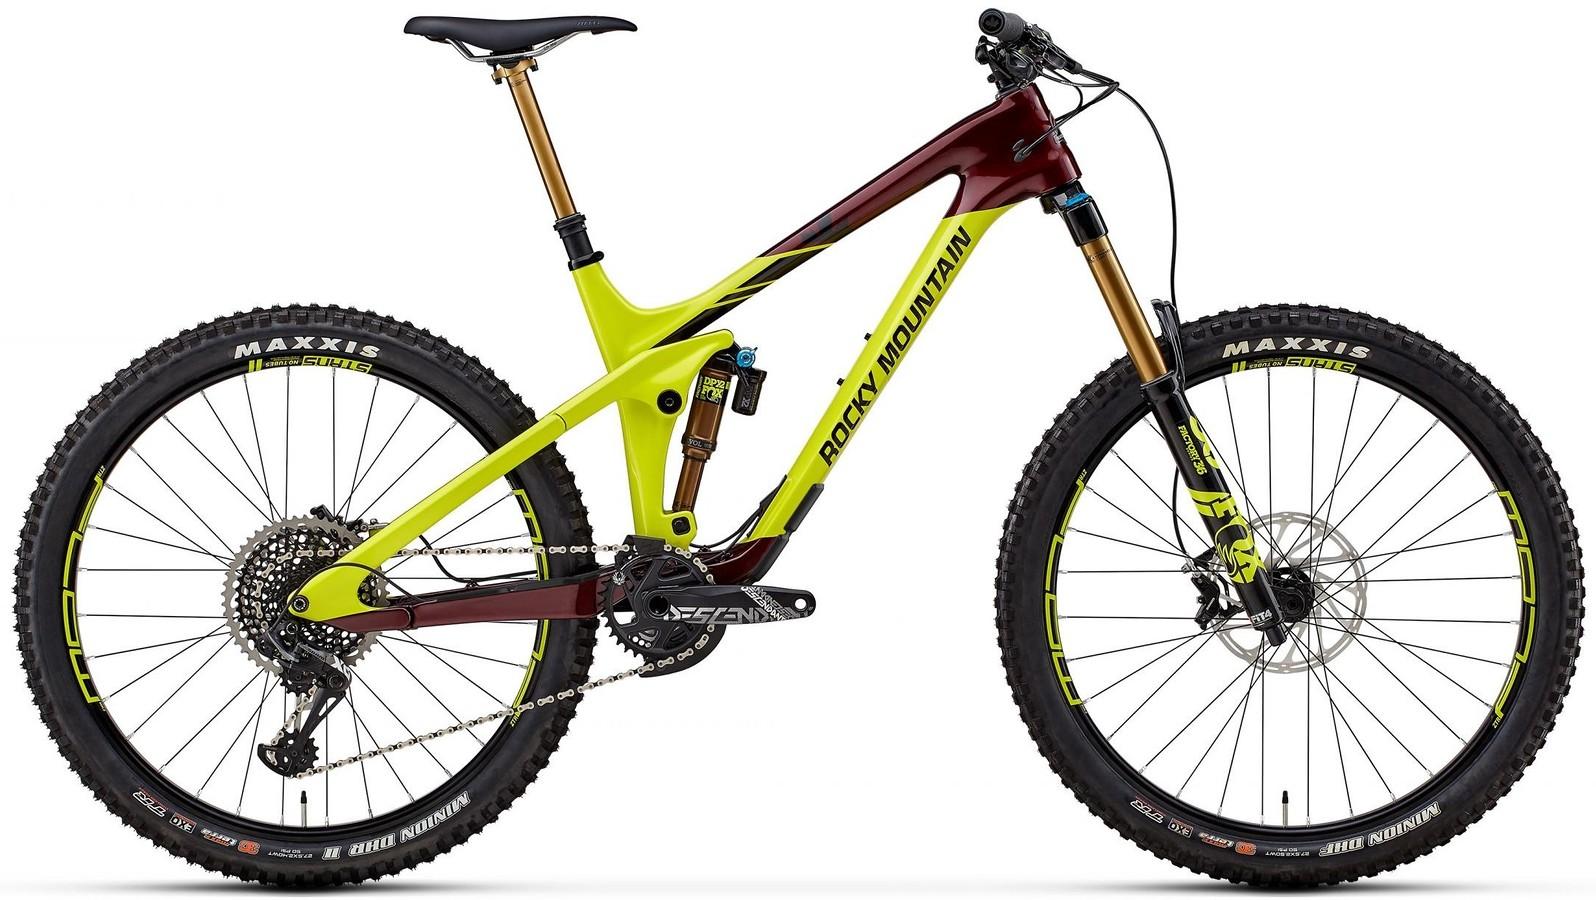 2018 Rocky Mountain Slayer Carbon 90 Bike Reviews Comparisons